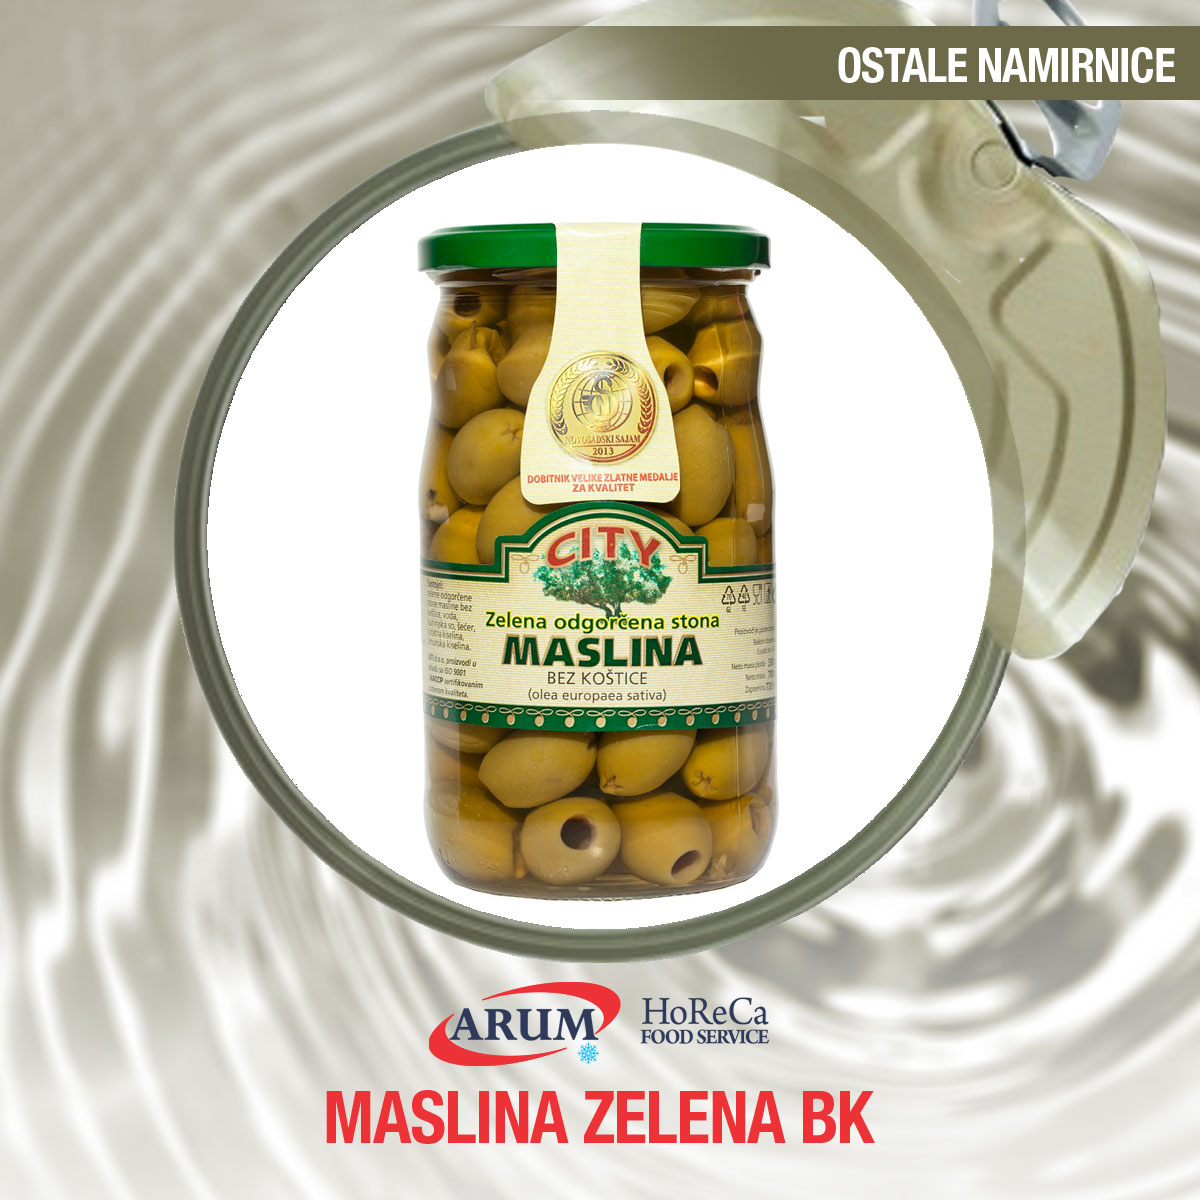 Maslina zelena bk 0.720